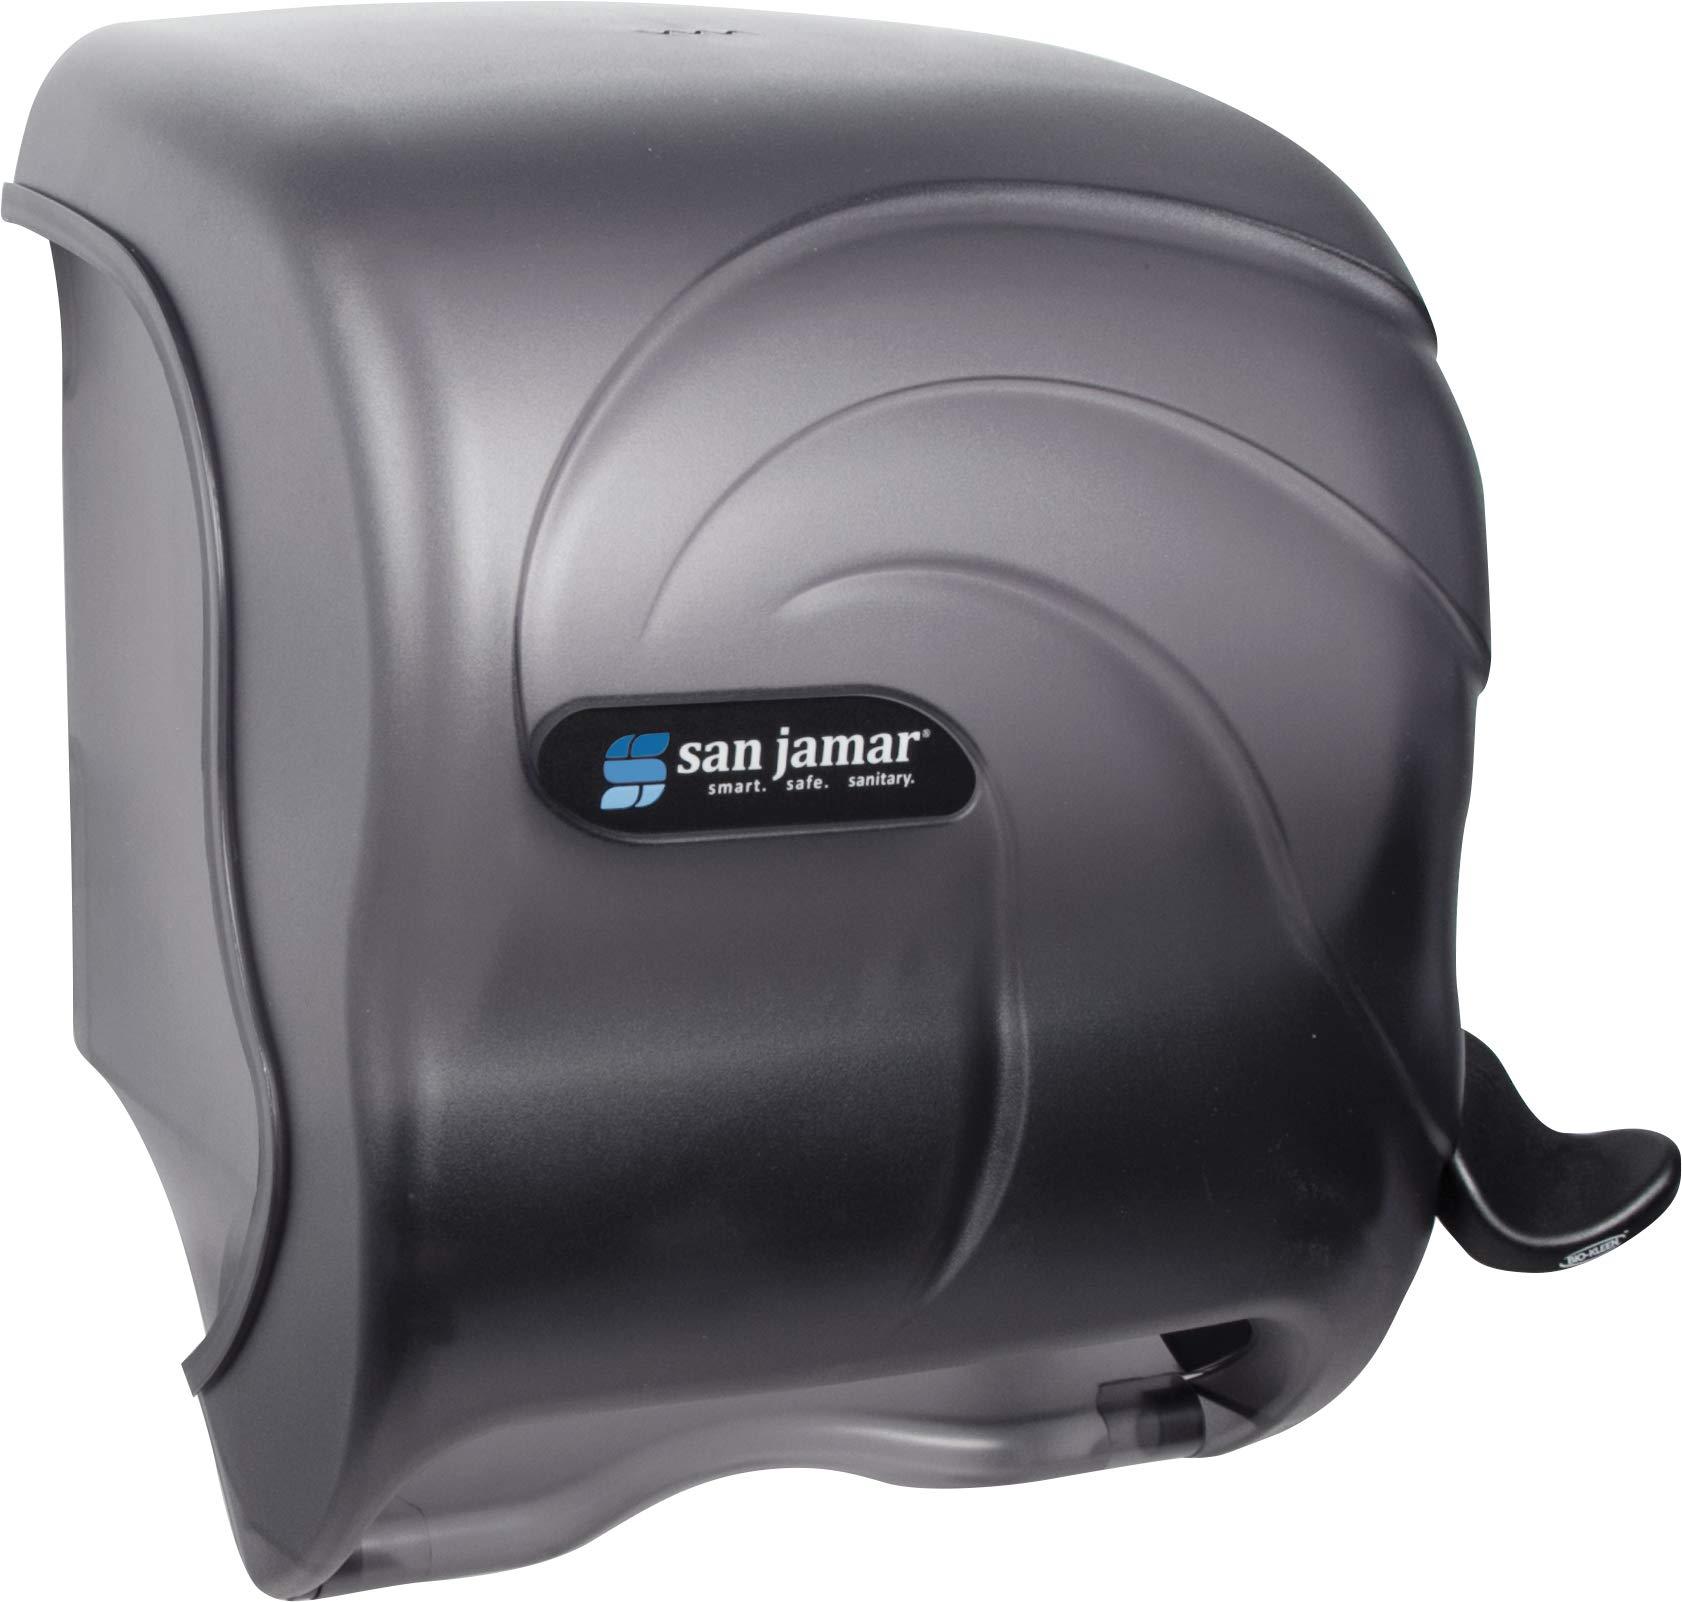 San Jamar T990TBK Element Lever Roll Towel Dispenser, Fits 8w, 8 Inch Diameter Paper Rolls, Oceans, Black, 12 1/2w x 8 1/2d x 12 3/4h by San Jamar